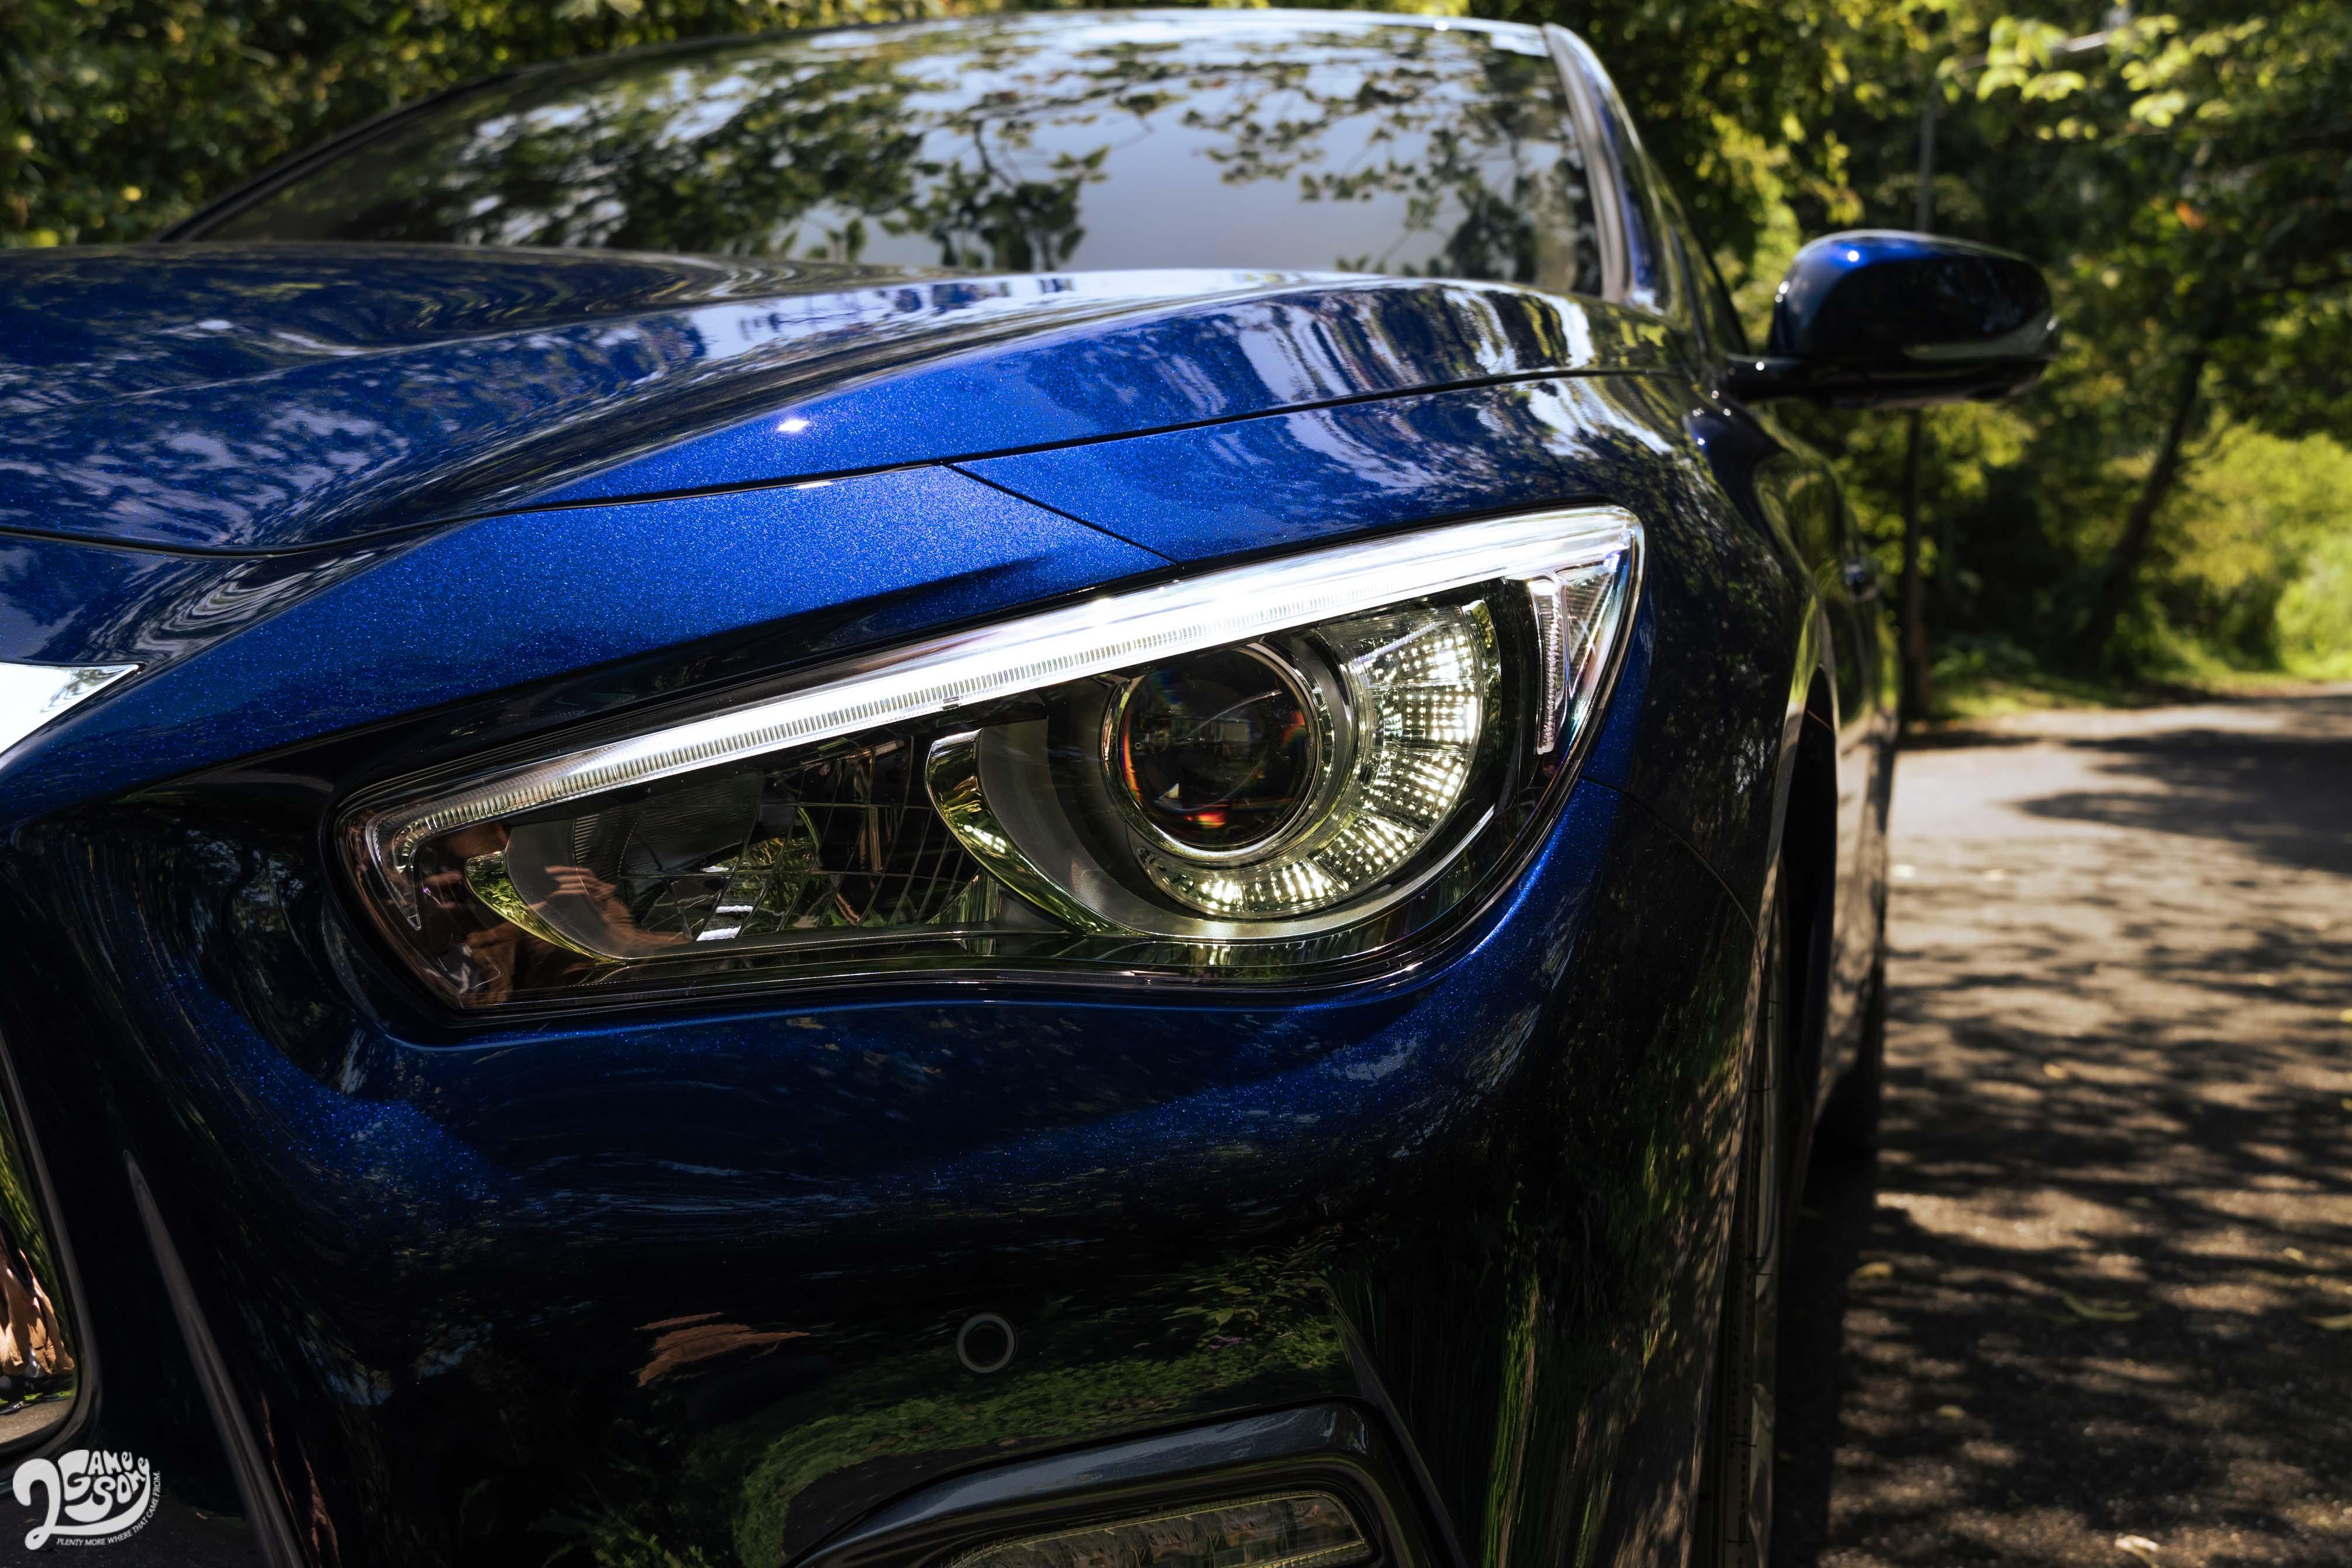 Silver Sport 的 LED 狩獵者頭燈配備主動轉向與遠近光自動啟閉功能。